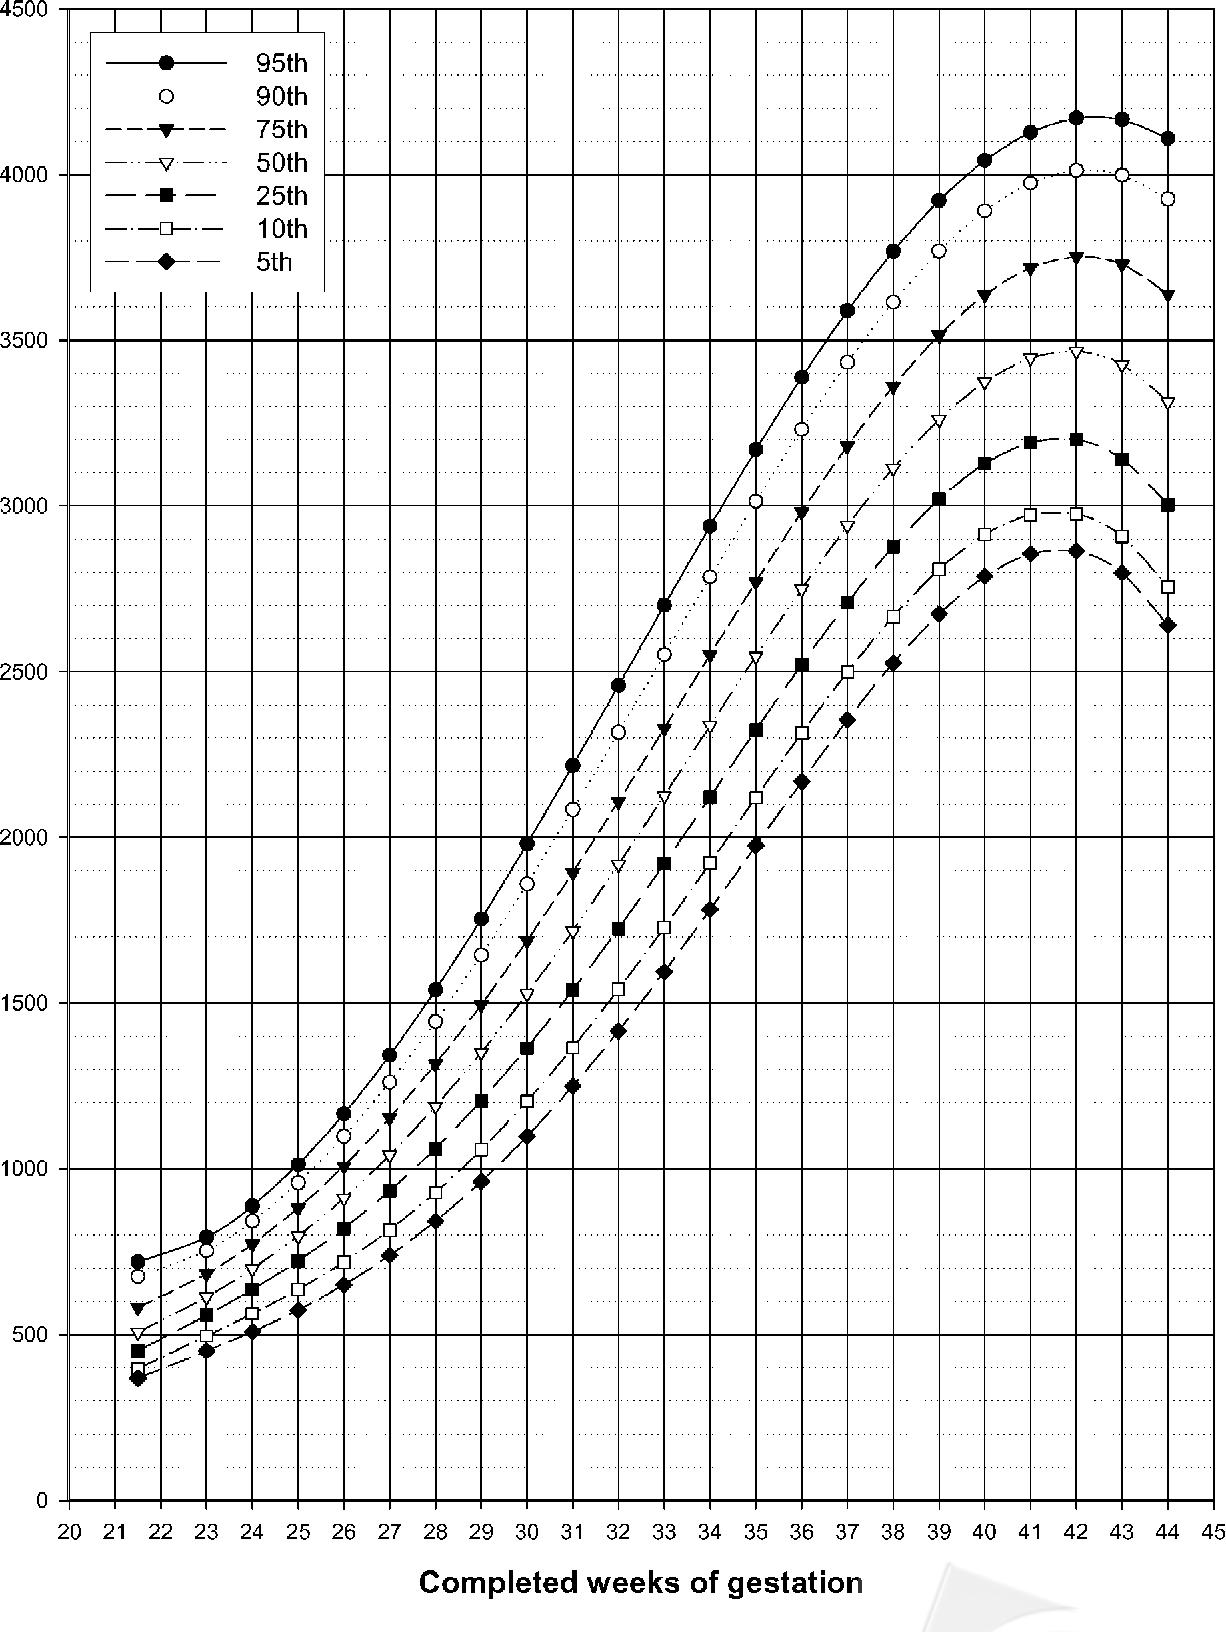 Nationwide Singleton Birth Weight Percentiles By Gestational Age In